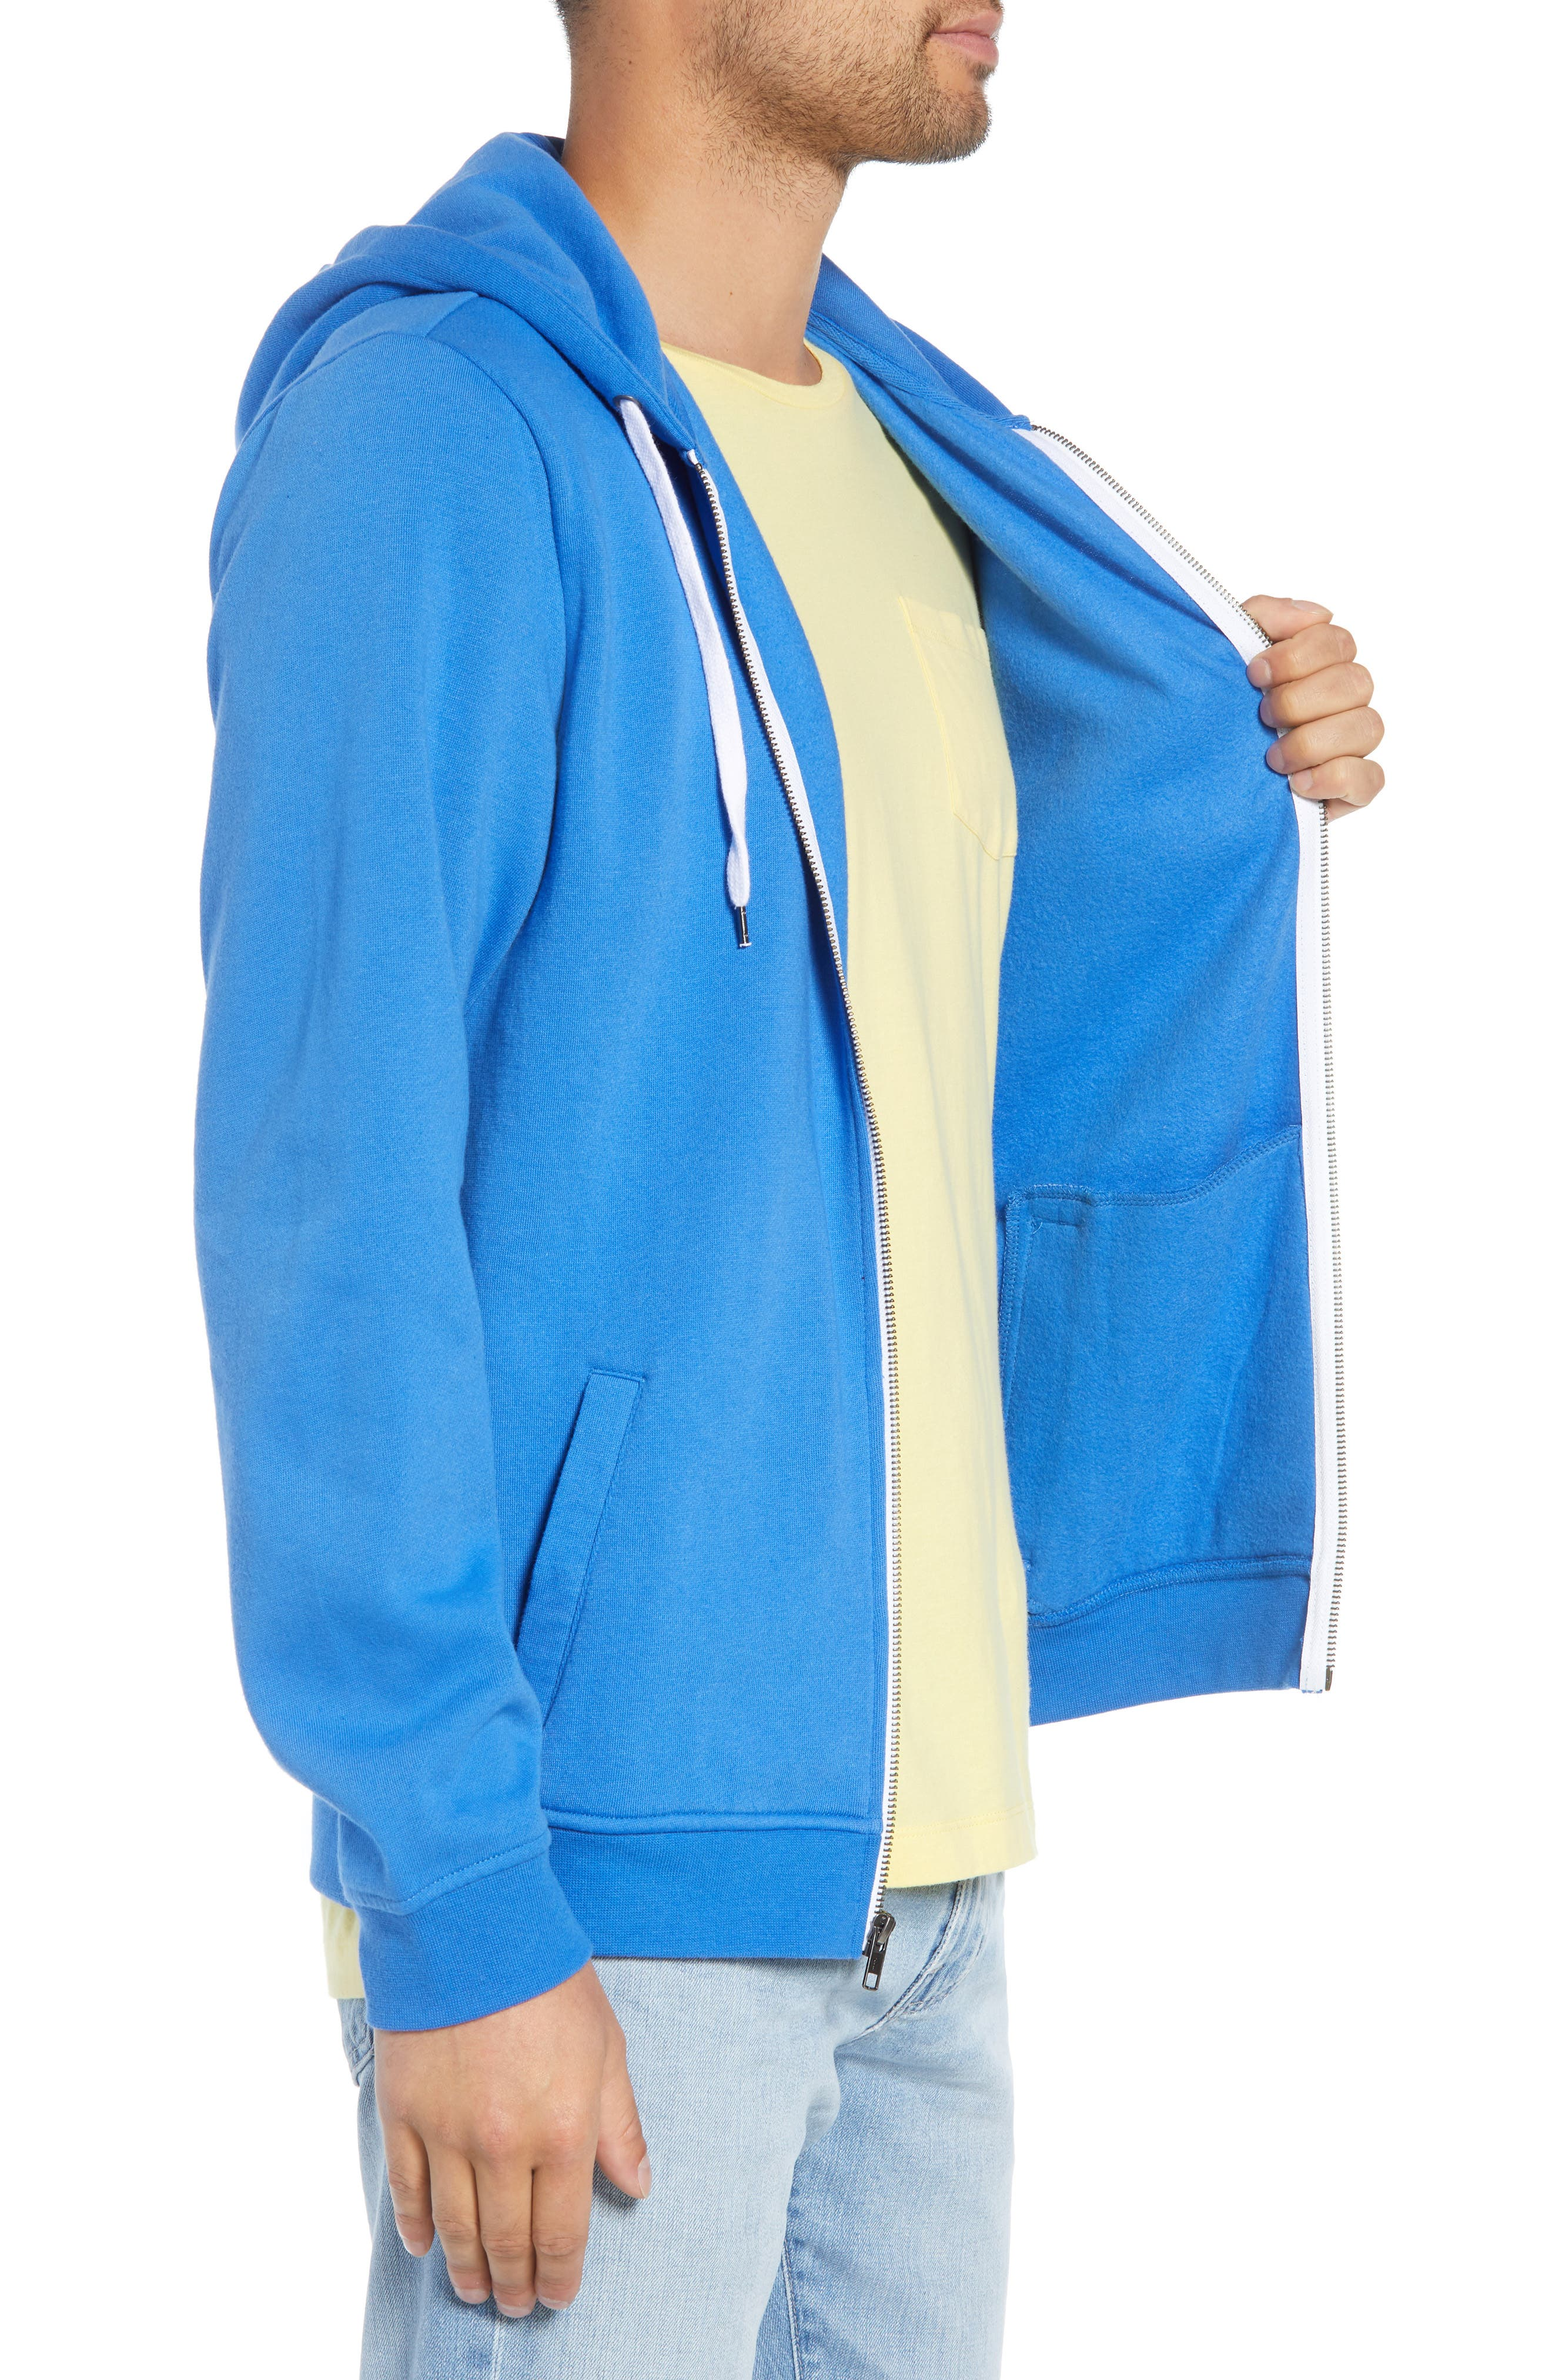 Full Zip Hoodie,                             Alternate thumbnail 3, color,                             BLUE BLISS